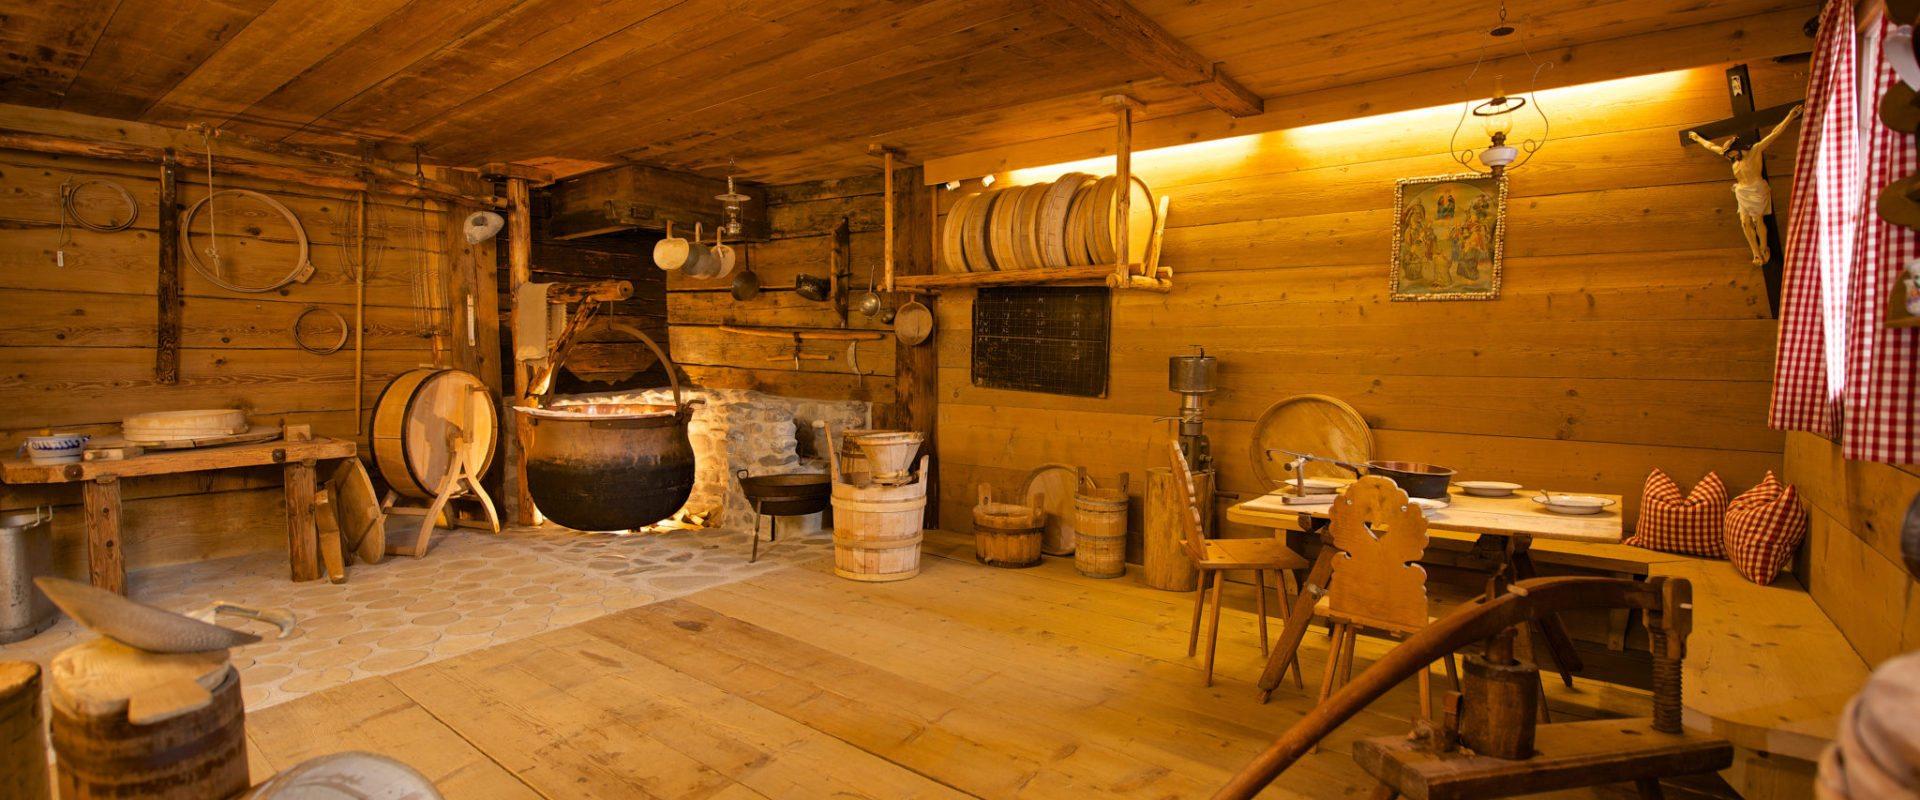 Alpsennereimuseum_Westallgäuer - Tobias Heimplätzer (3) - Kopie